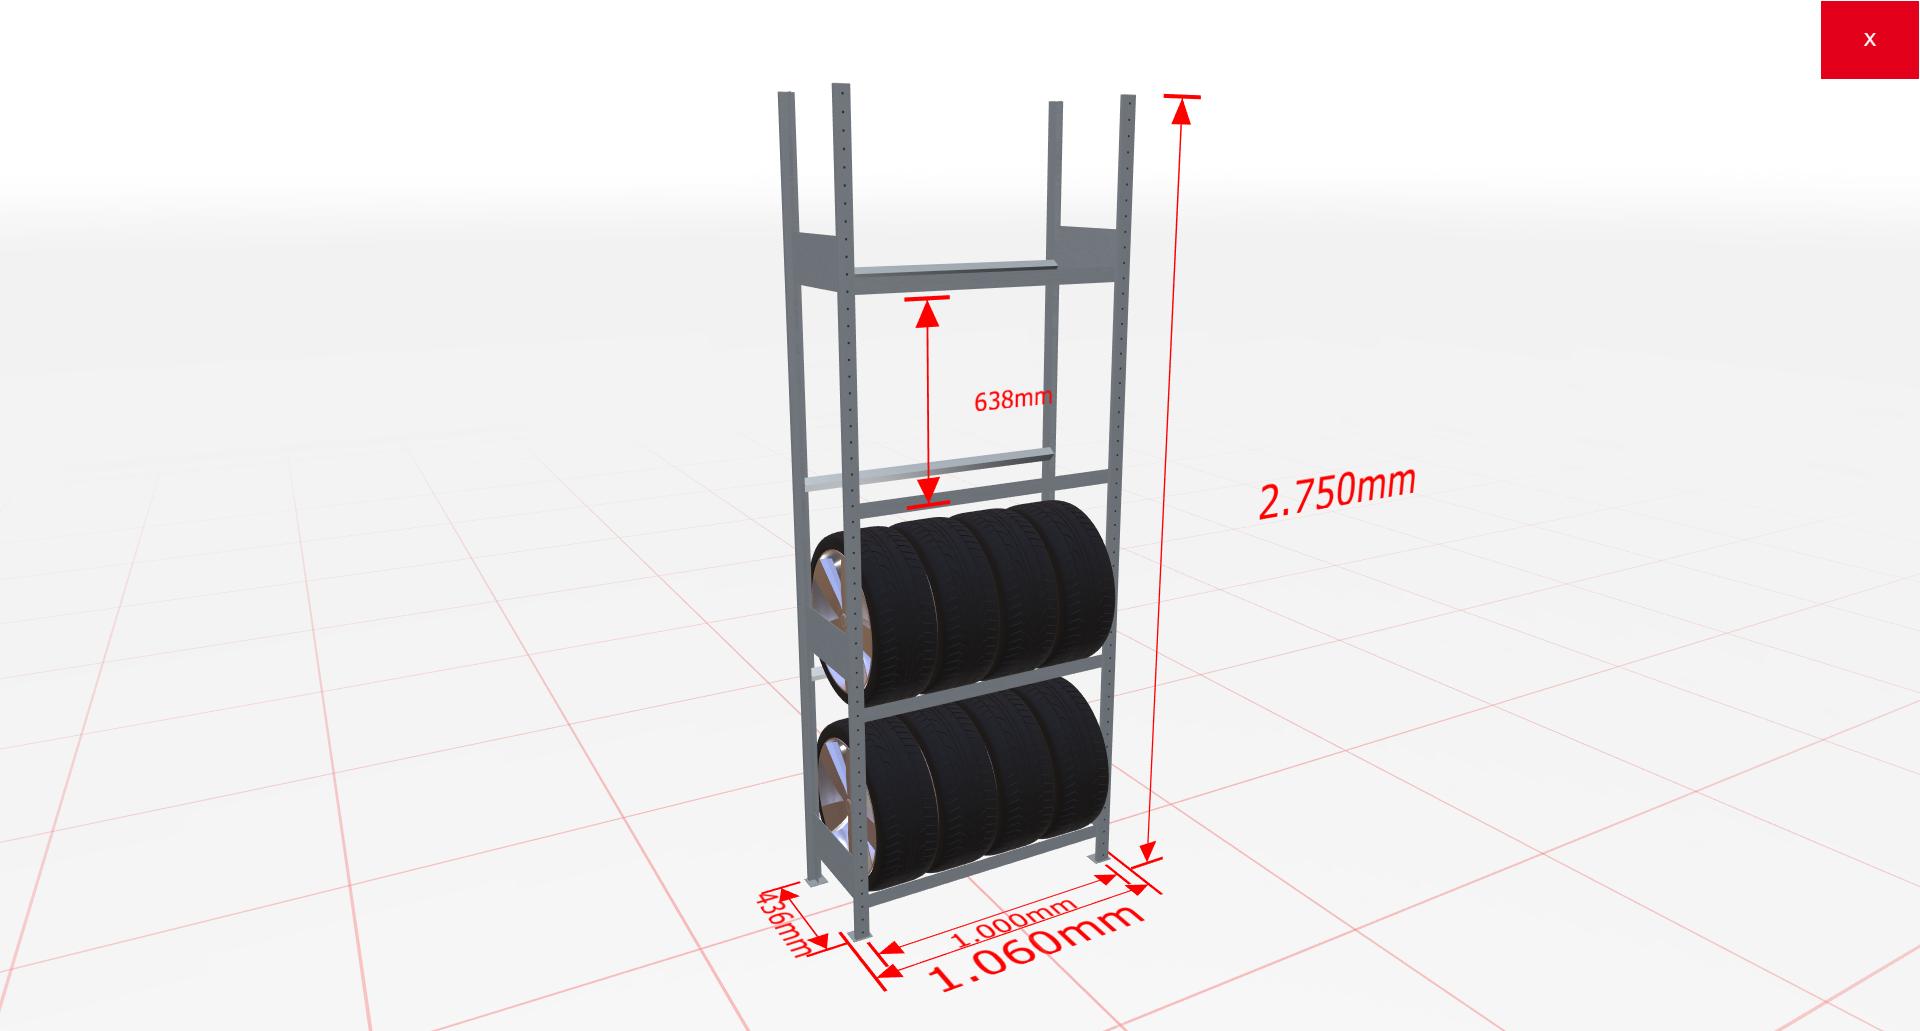 Räderregal Grundregal SCHULTE Lagertechnik 2750x1000x400 mm – 4 Ebenen á 1000 mm, verzinkt